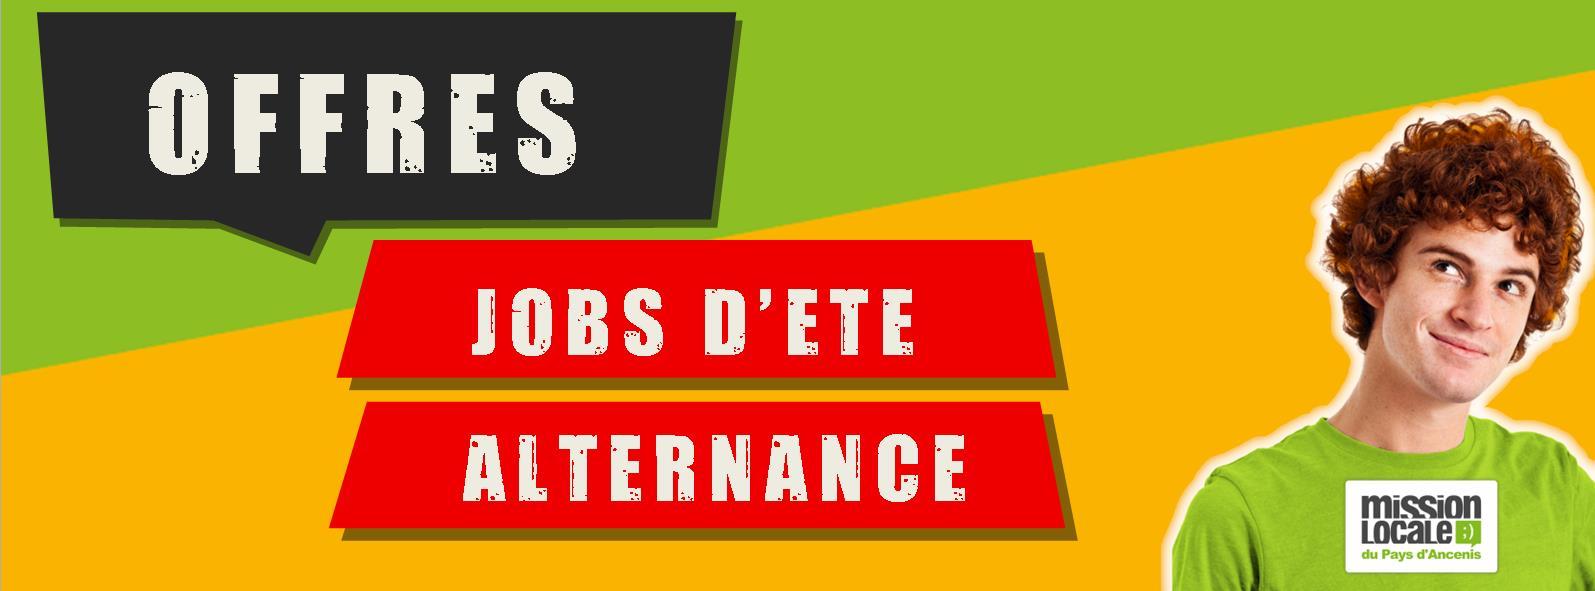 offres jobs ete alternance 2017